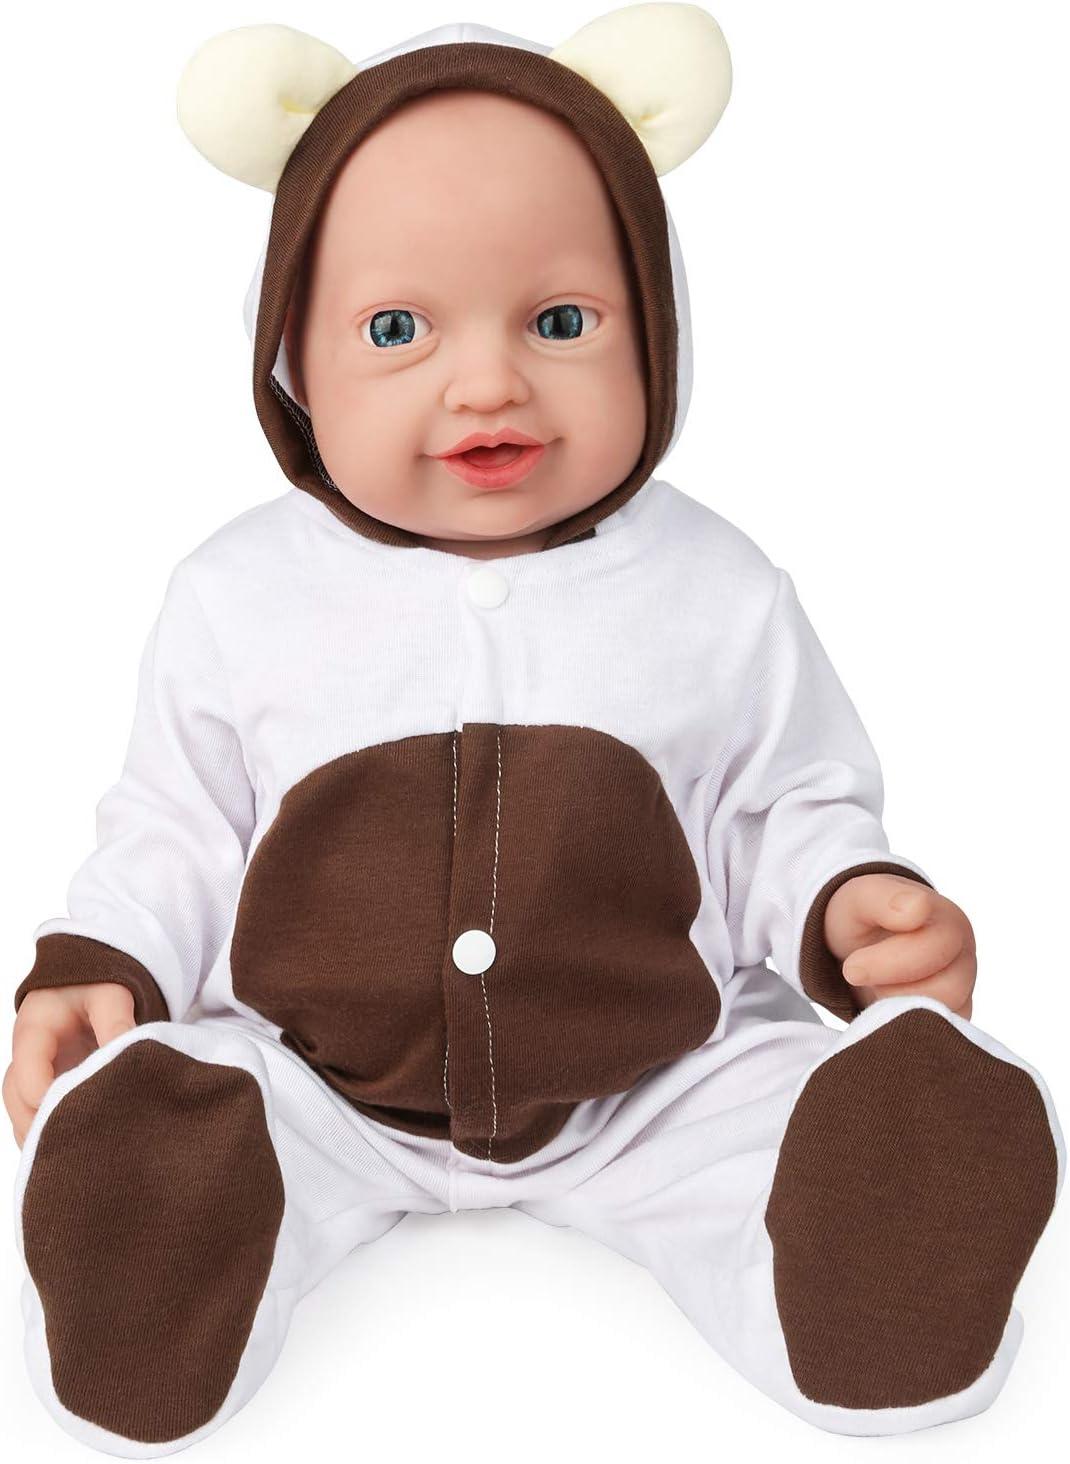 23/'/' Handmade Lifelike Newborn Full Body Silicone Vinyl Reborn Gift Baby Dolls